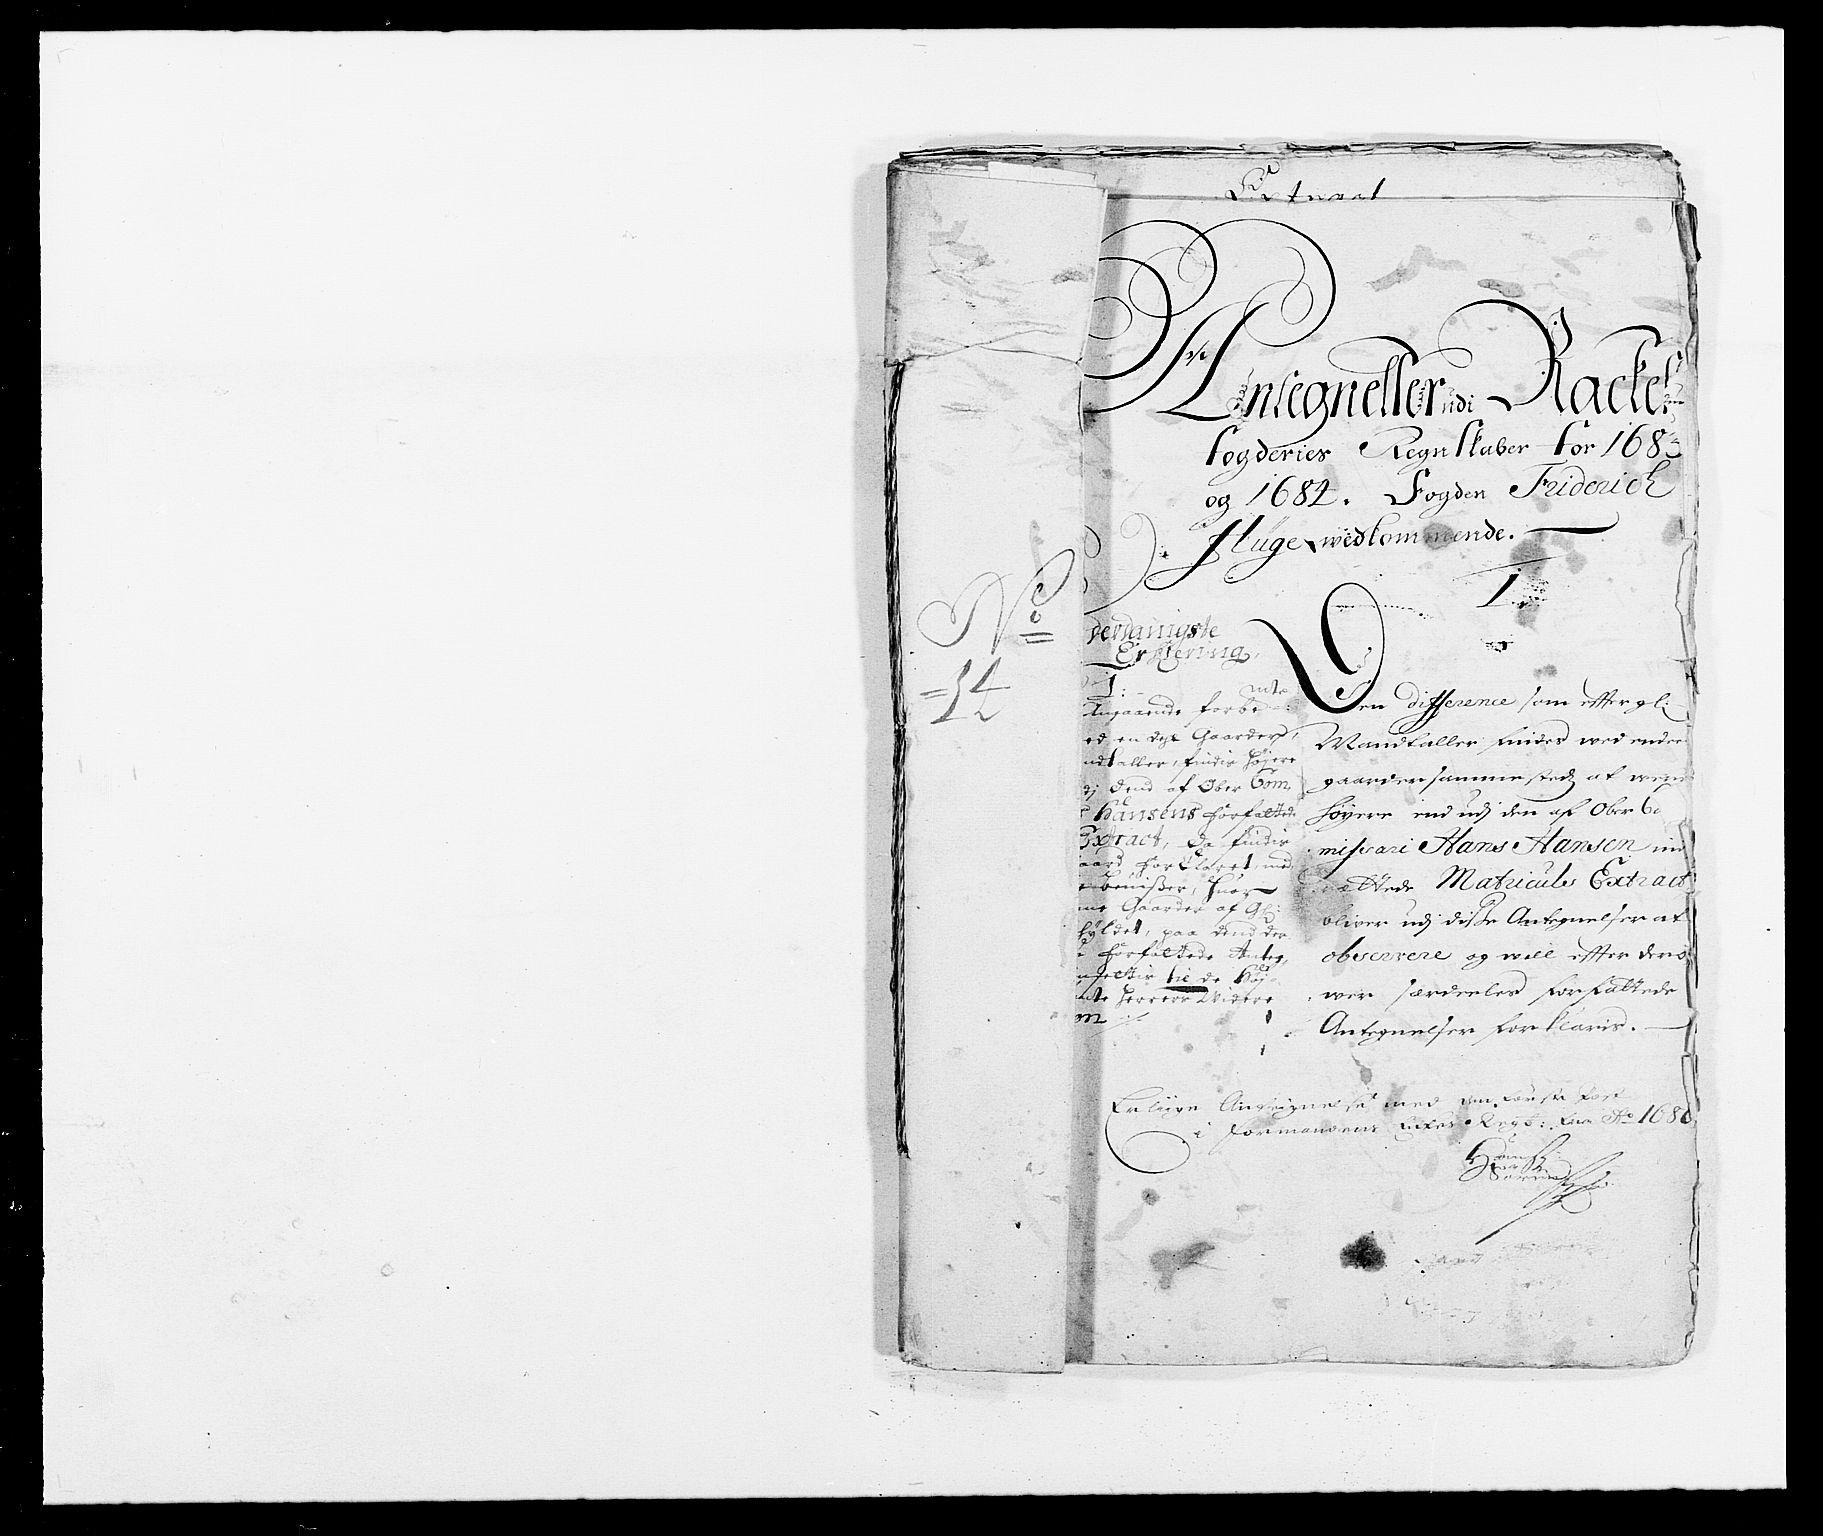 RA, Rentekammeret inntil 1814, Reviderte regnskaper, Fogderegnskap, R05/L0276: Fogderegnskap Rakkestad, 1683-1688, s. 333